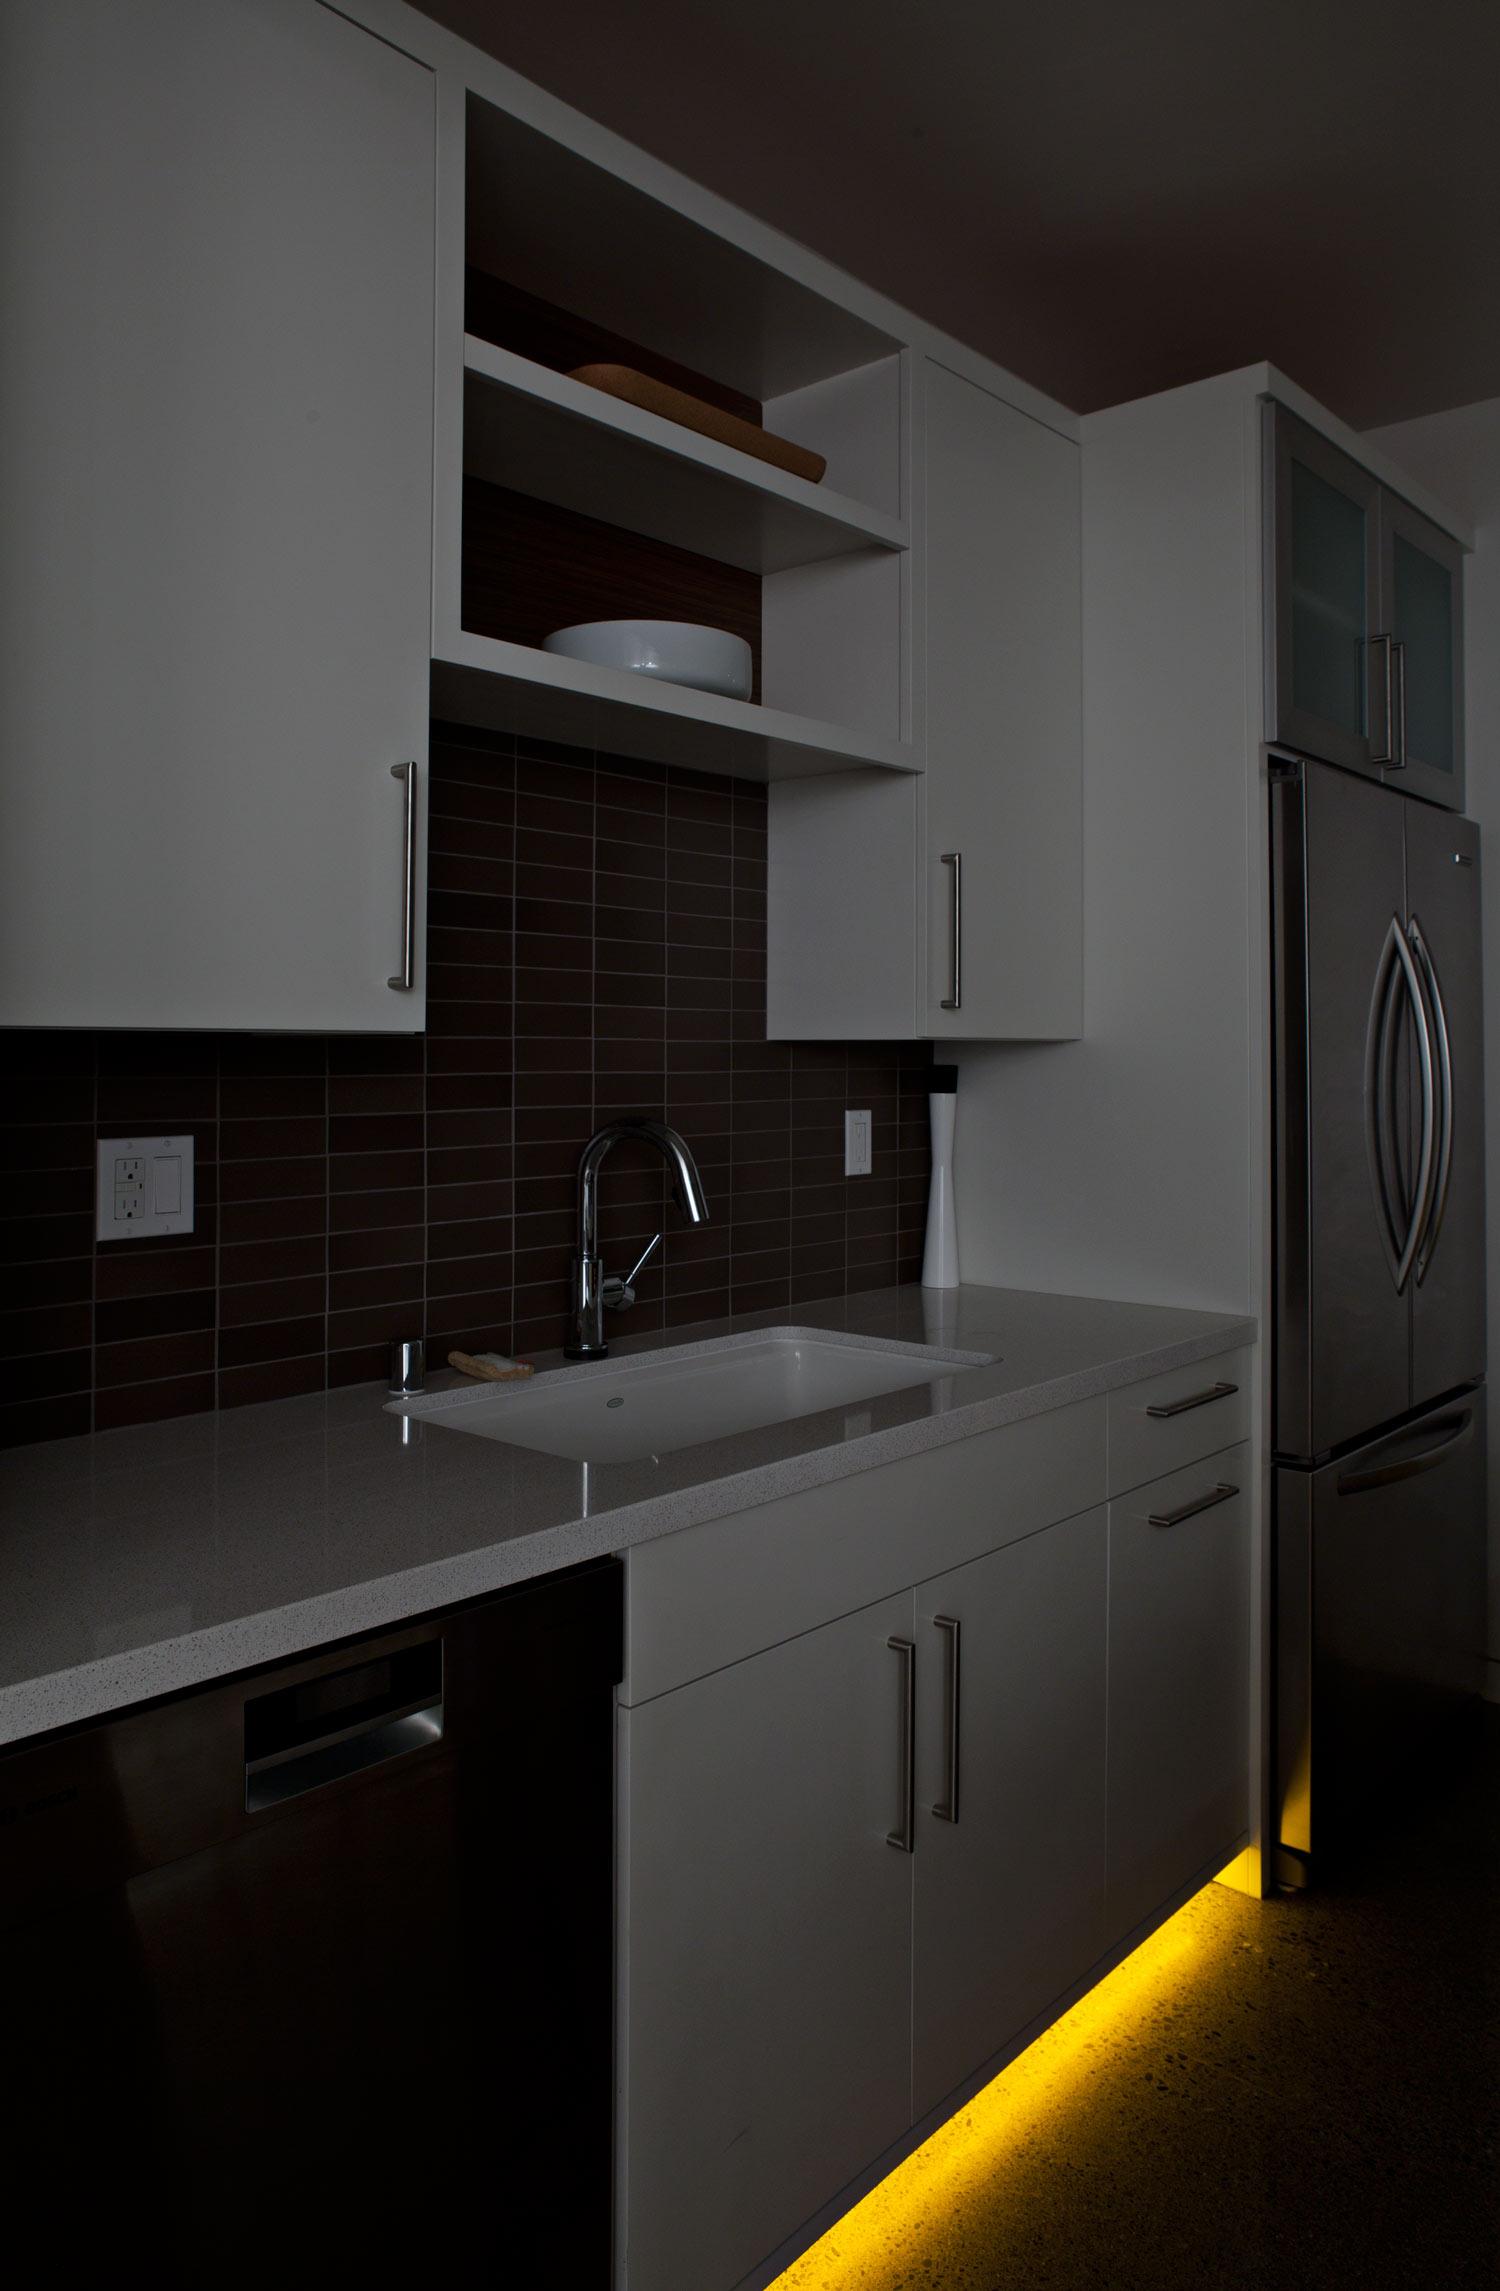 honda_smart_home_us_lighting_11WEB.jpg